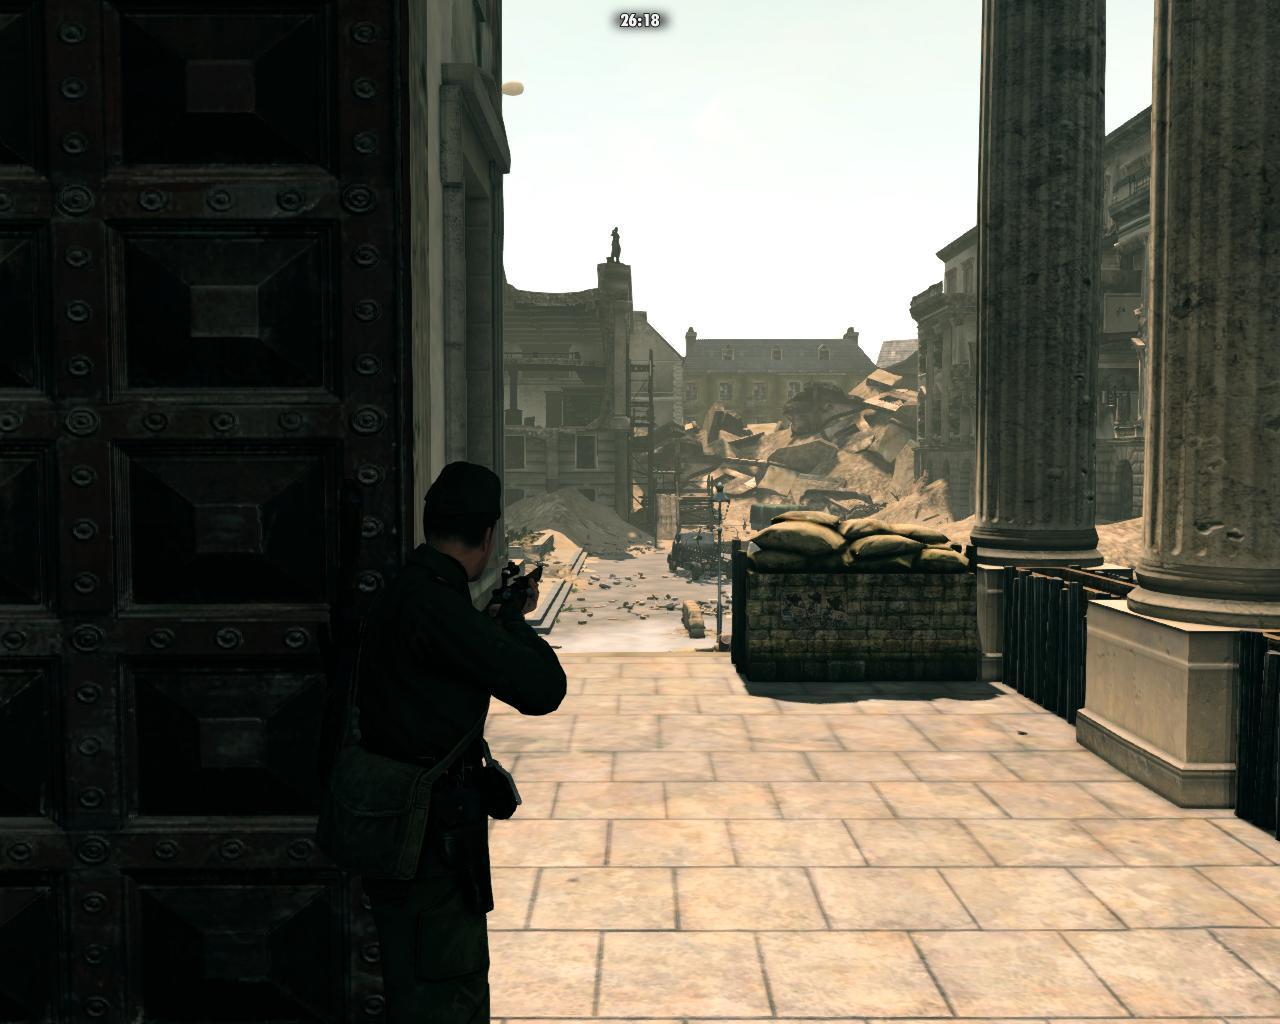 jeuxvideo.com Sniper Elite V2 - PC Image 17 sur 34